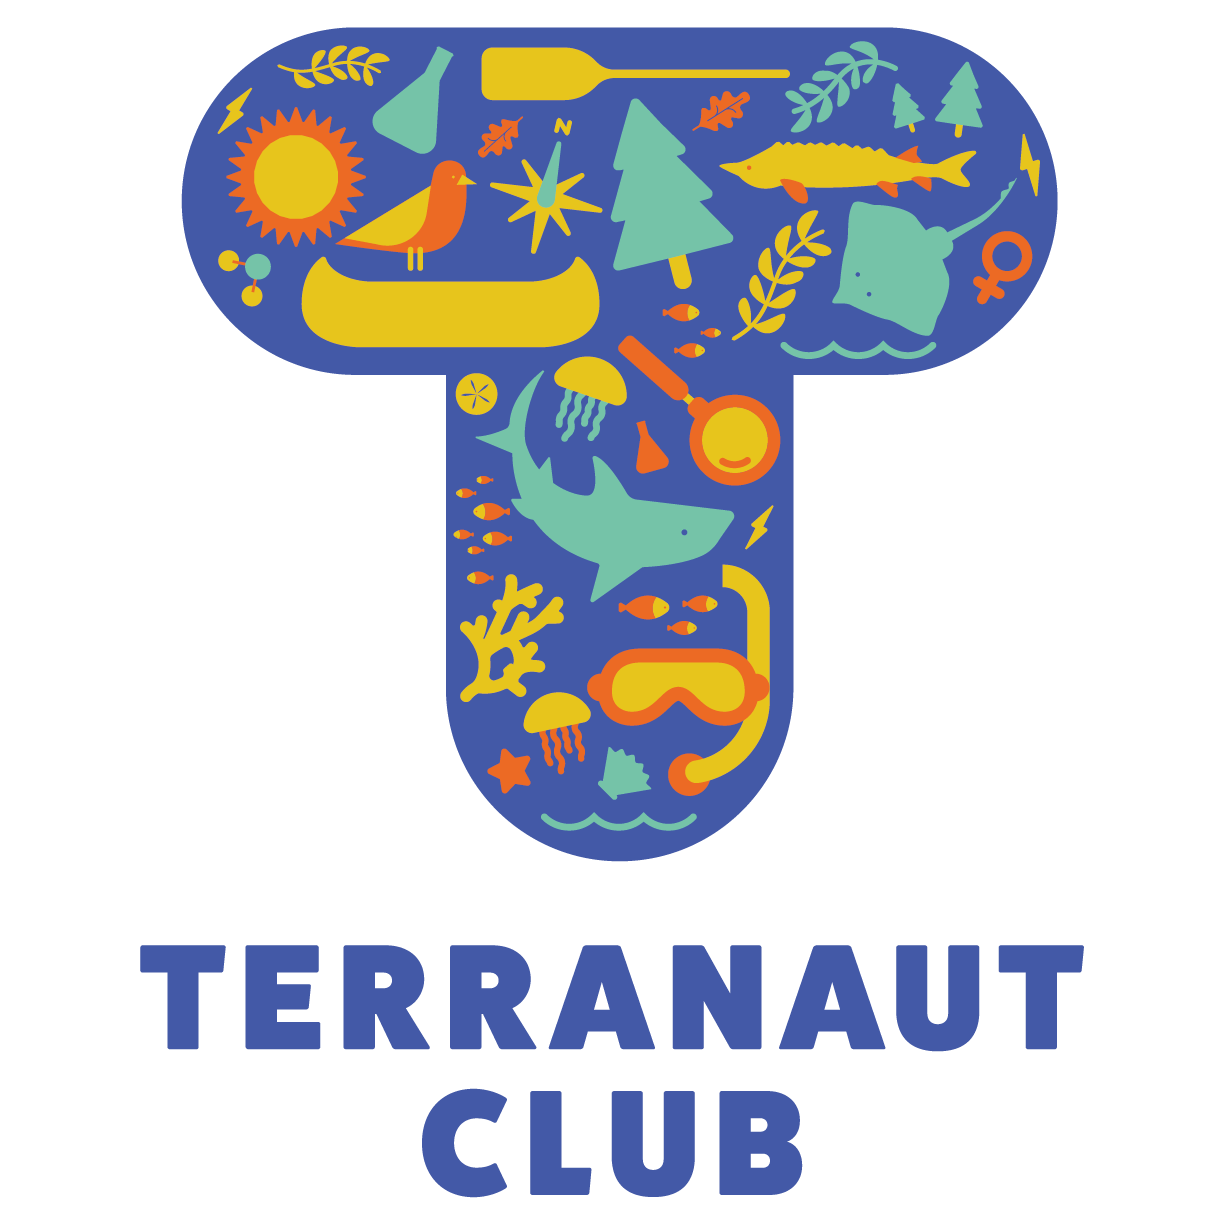 Terranaut Club